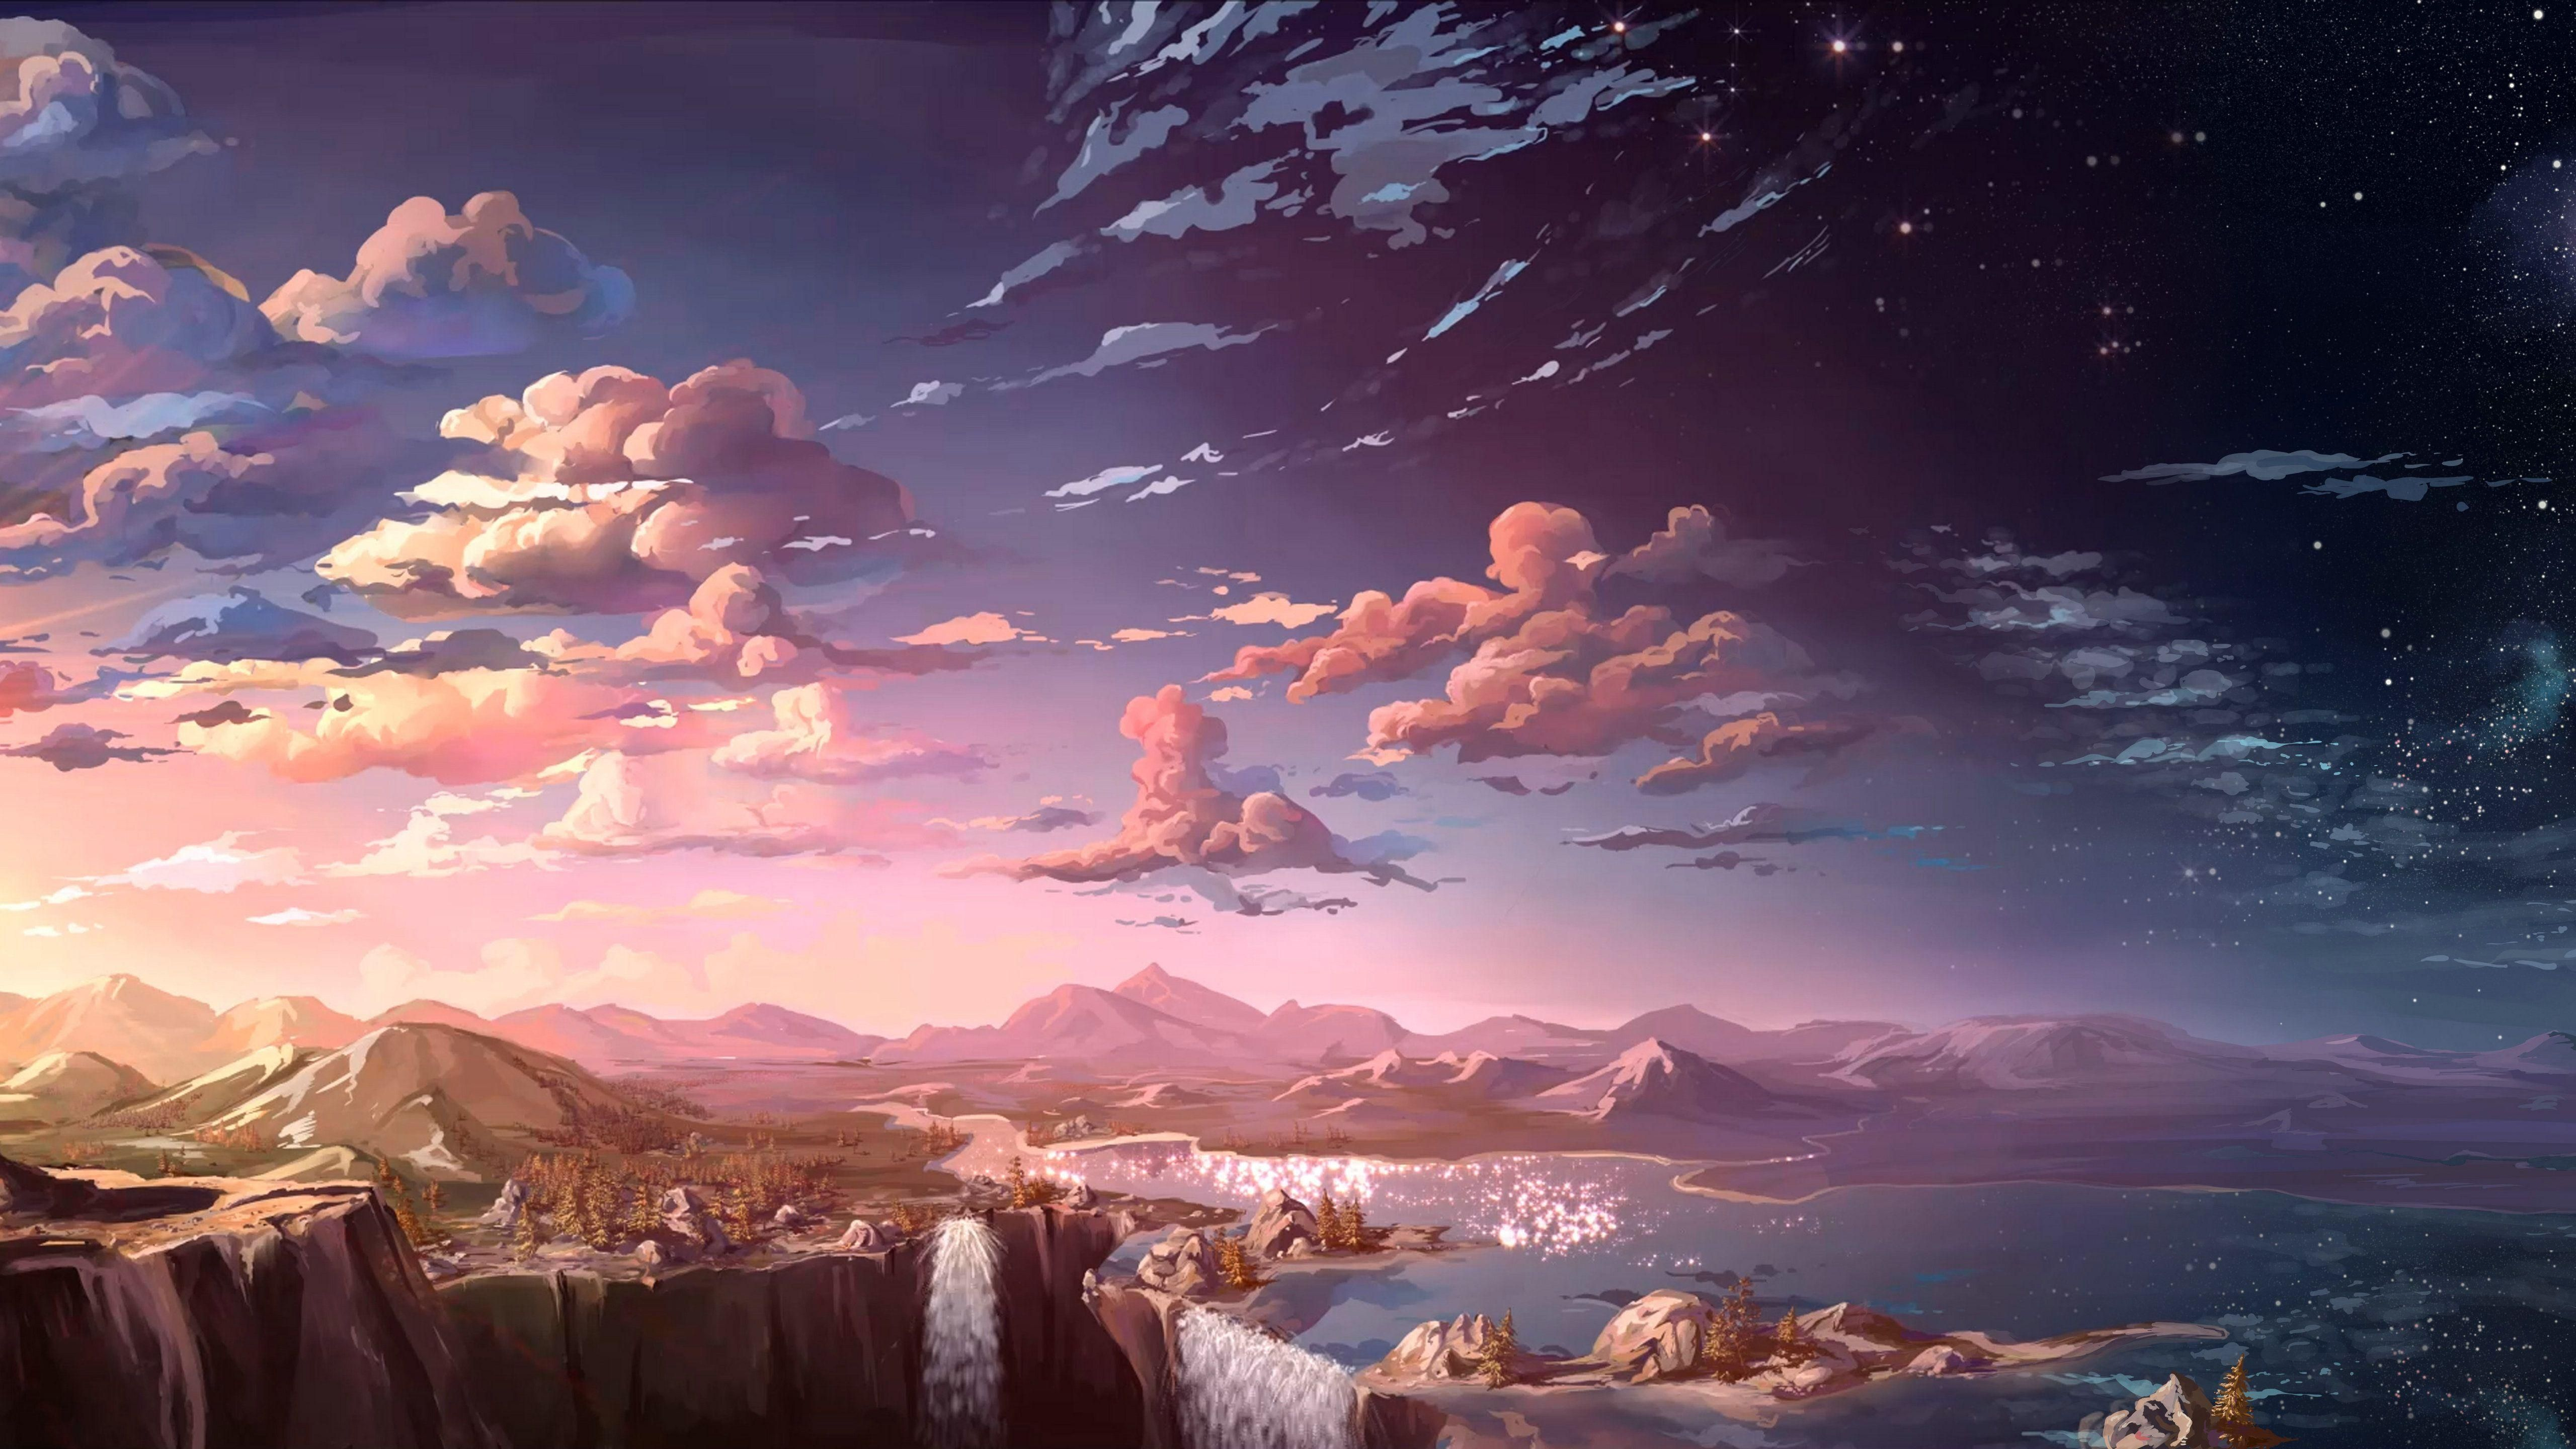 Anime Scenery Art Anime Scenery Scenery Wallpaper Anime Scenery Wallpaper